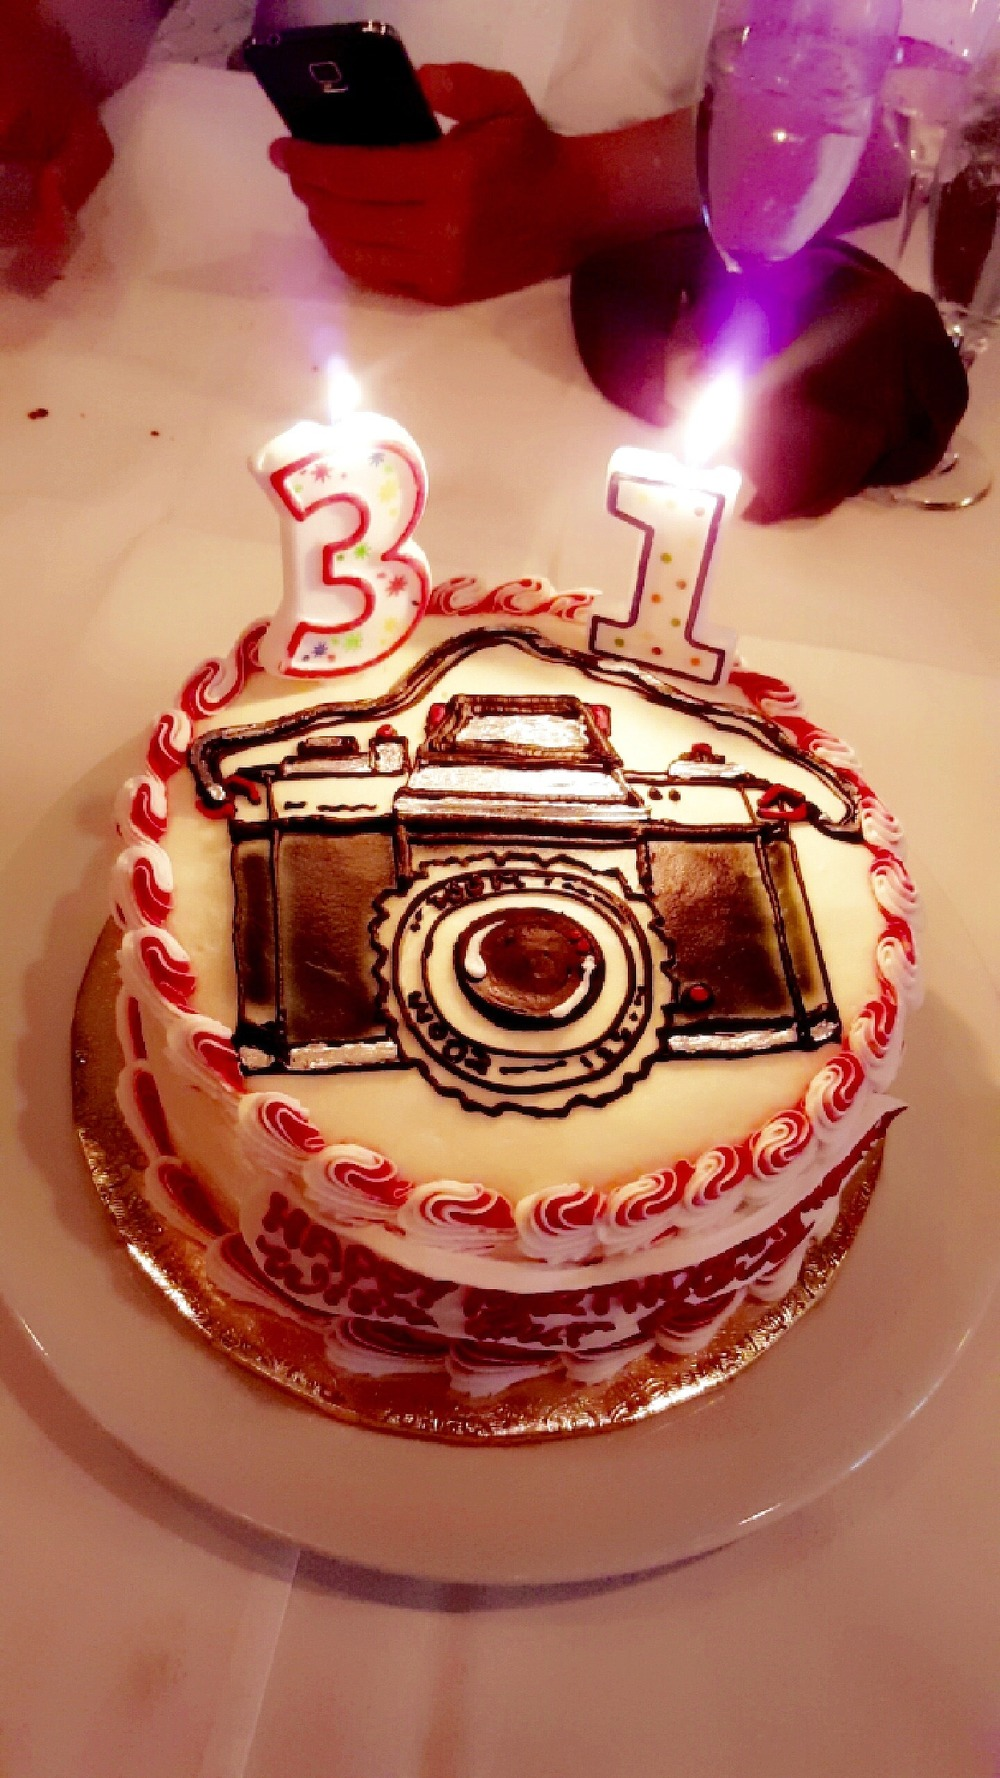 My 31st Birthday - 4 of 13.jpg